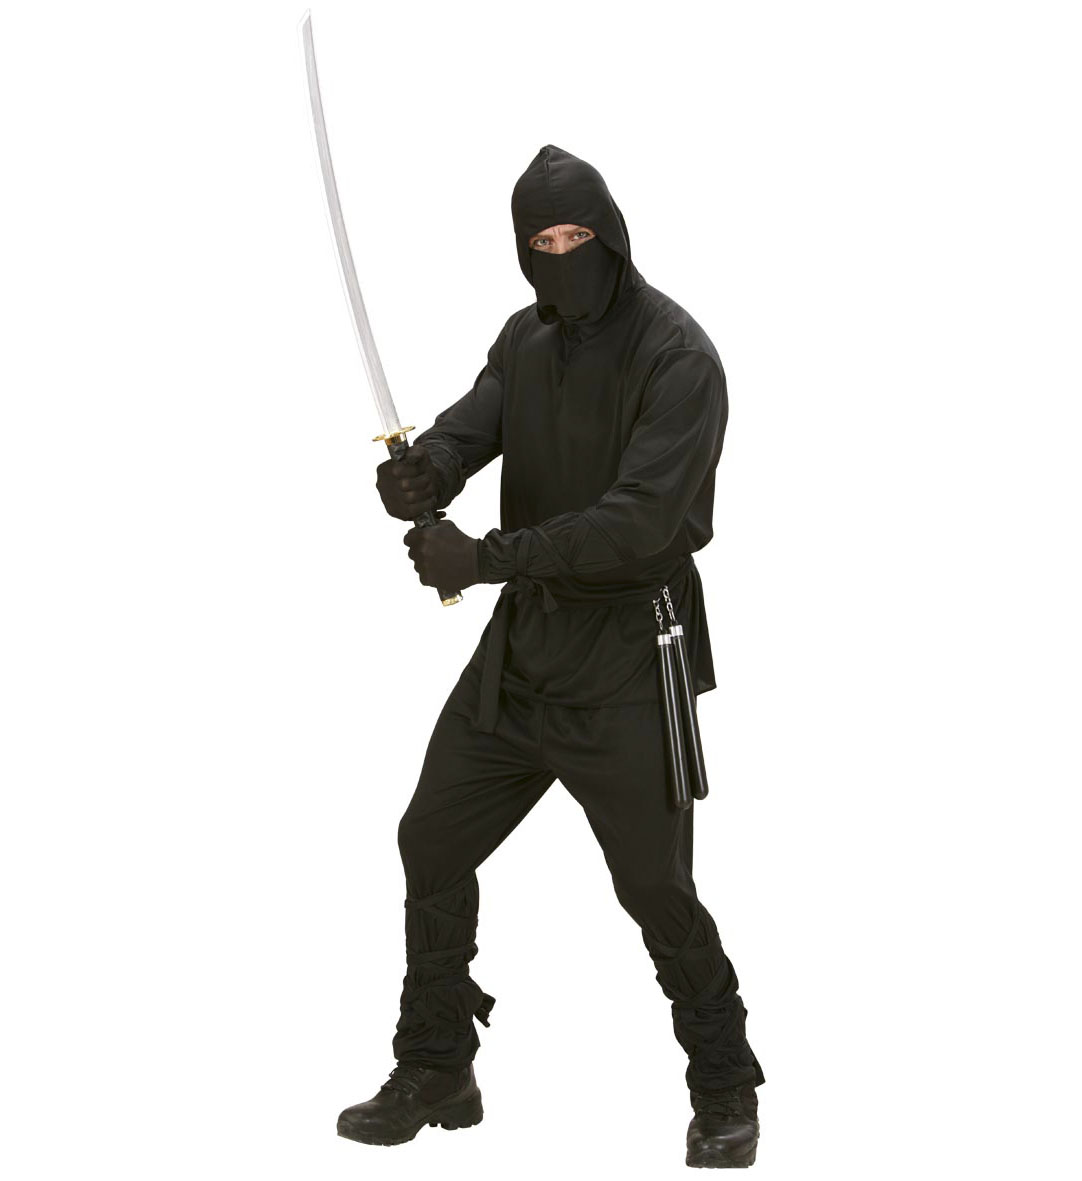 5 tlg ninja kost m ninjakost m samurai herren s 48 m 50 l 52 ebay. Black Bedroom Furniture Sets. Home Design Ideas